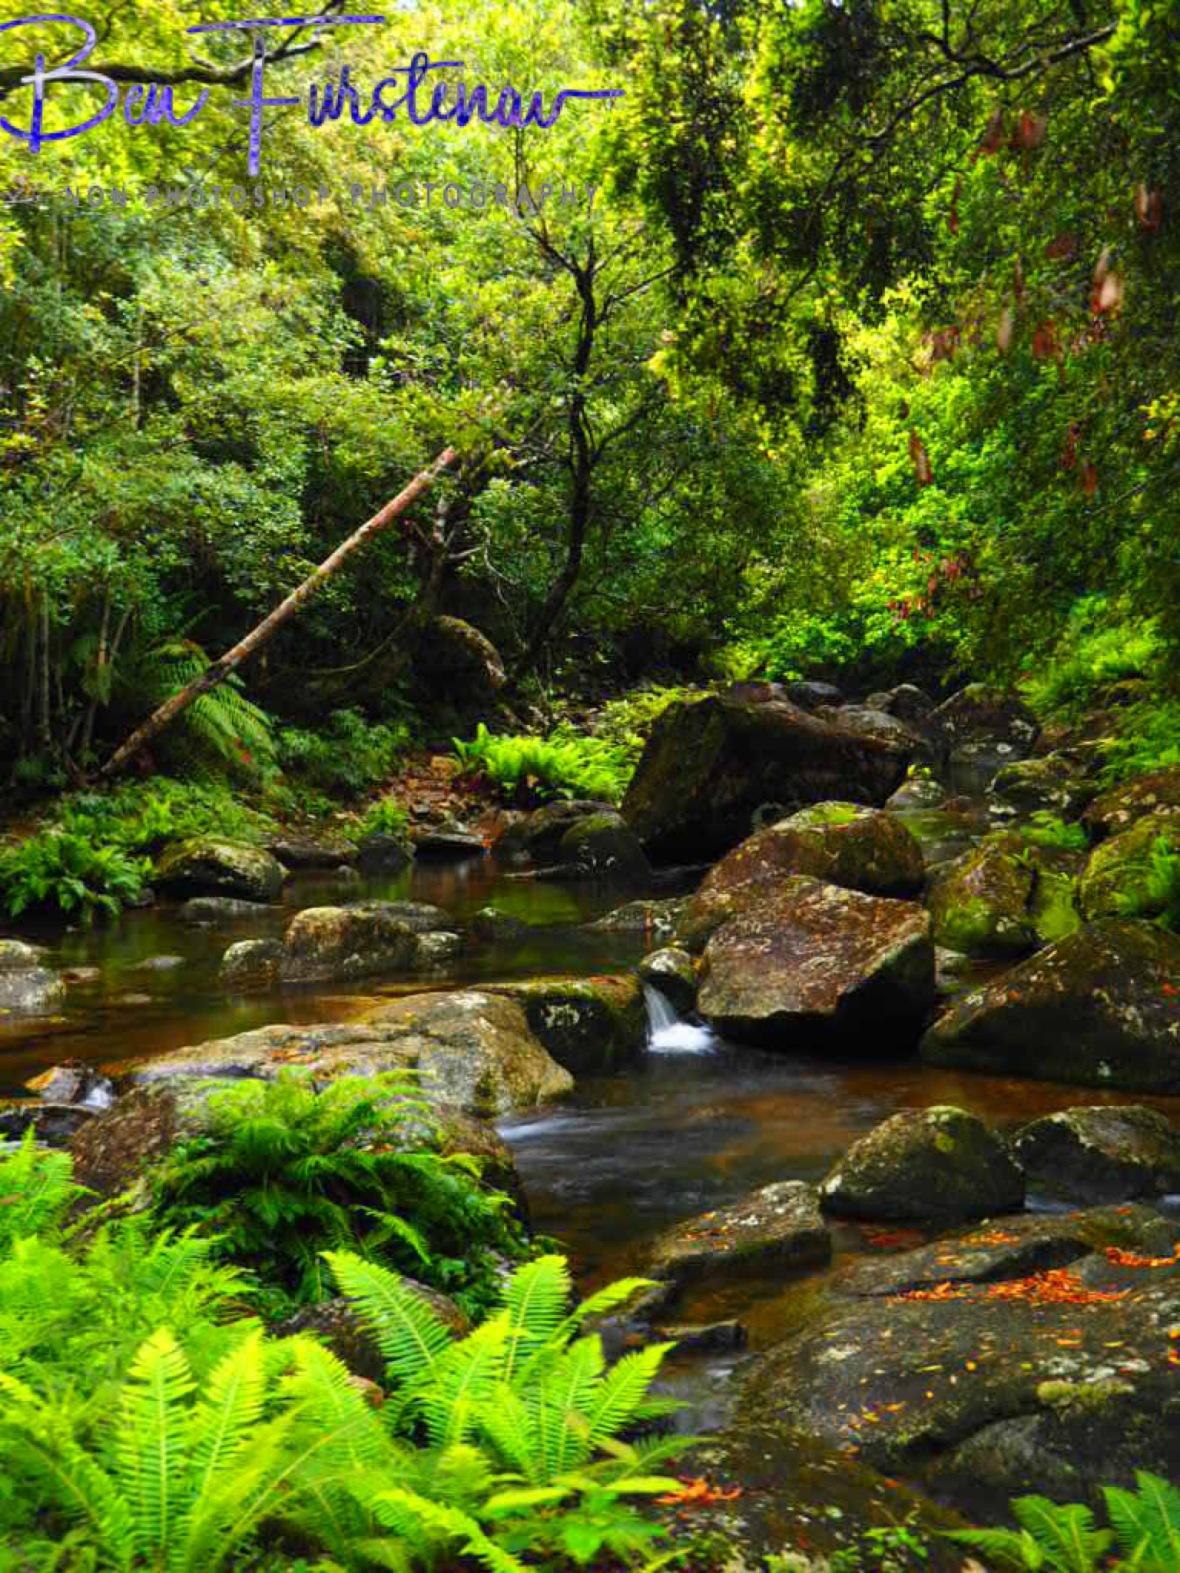 Washpool Creek gently meandering along, Washpool National Park, NSW, Australia